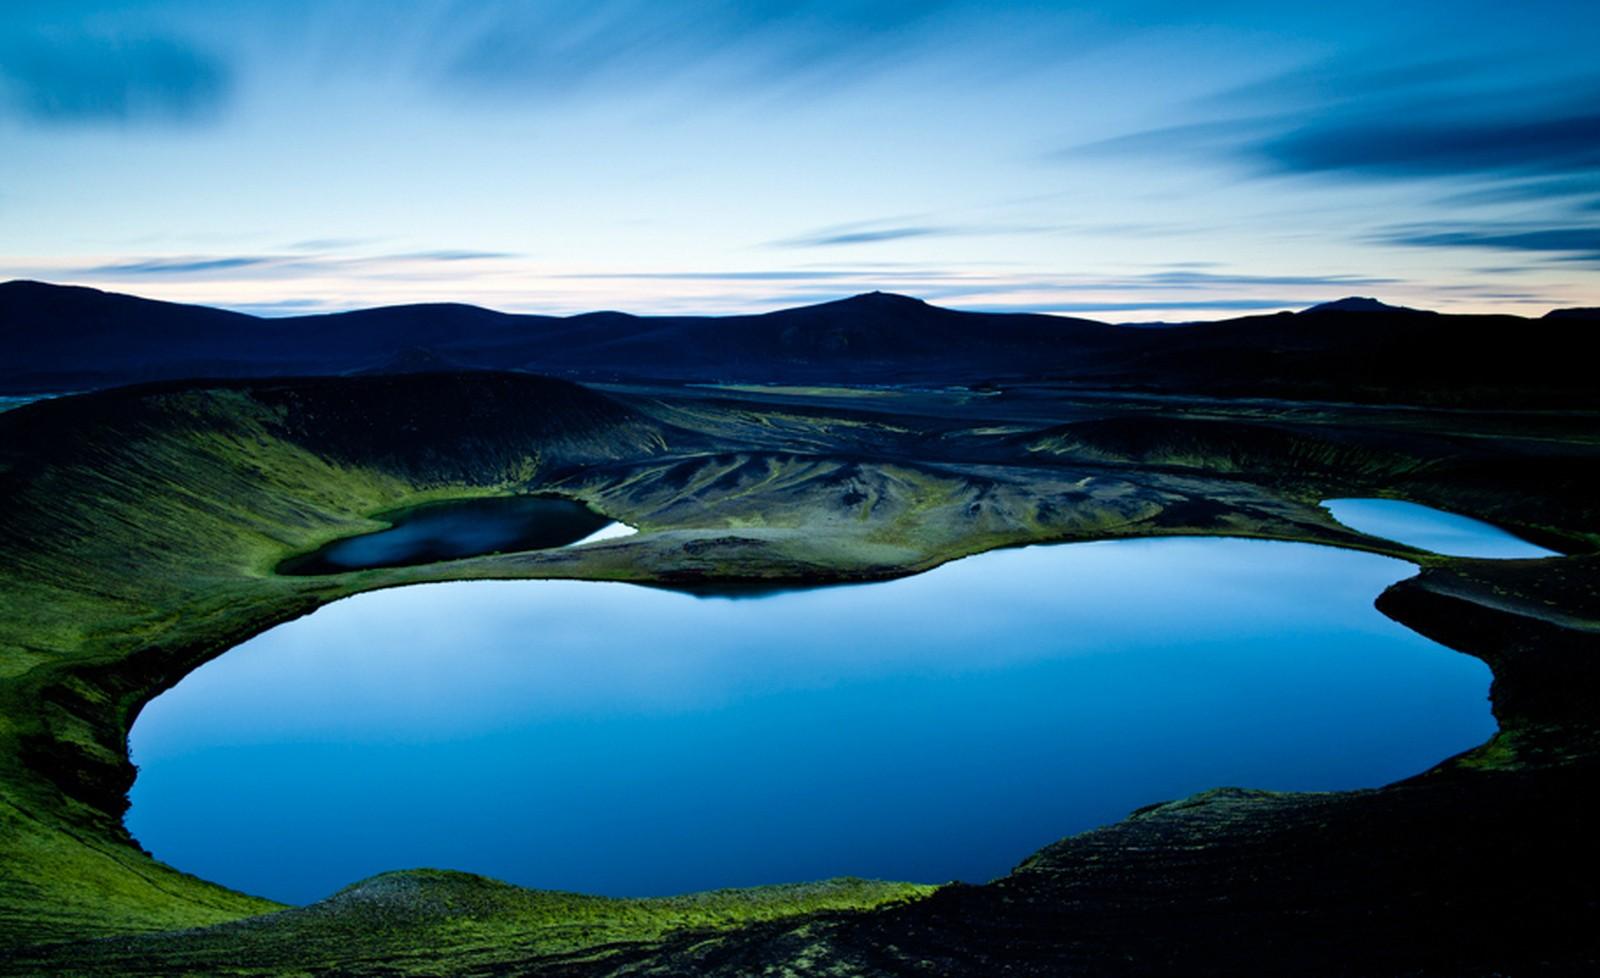 Pro Photo Tips By Award-winning Photographer Joshua Holko